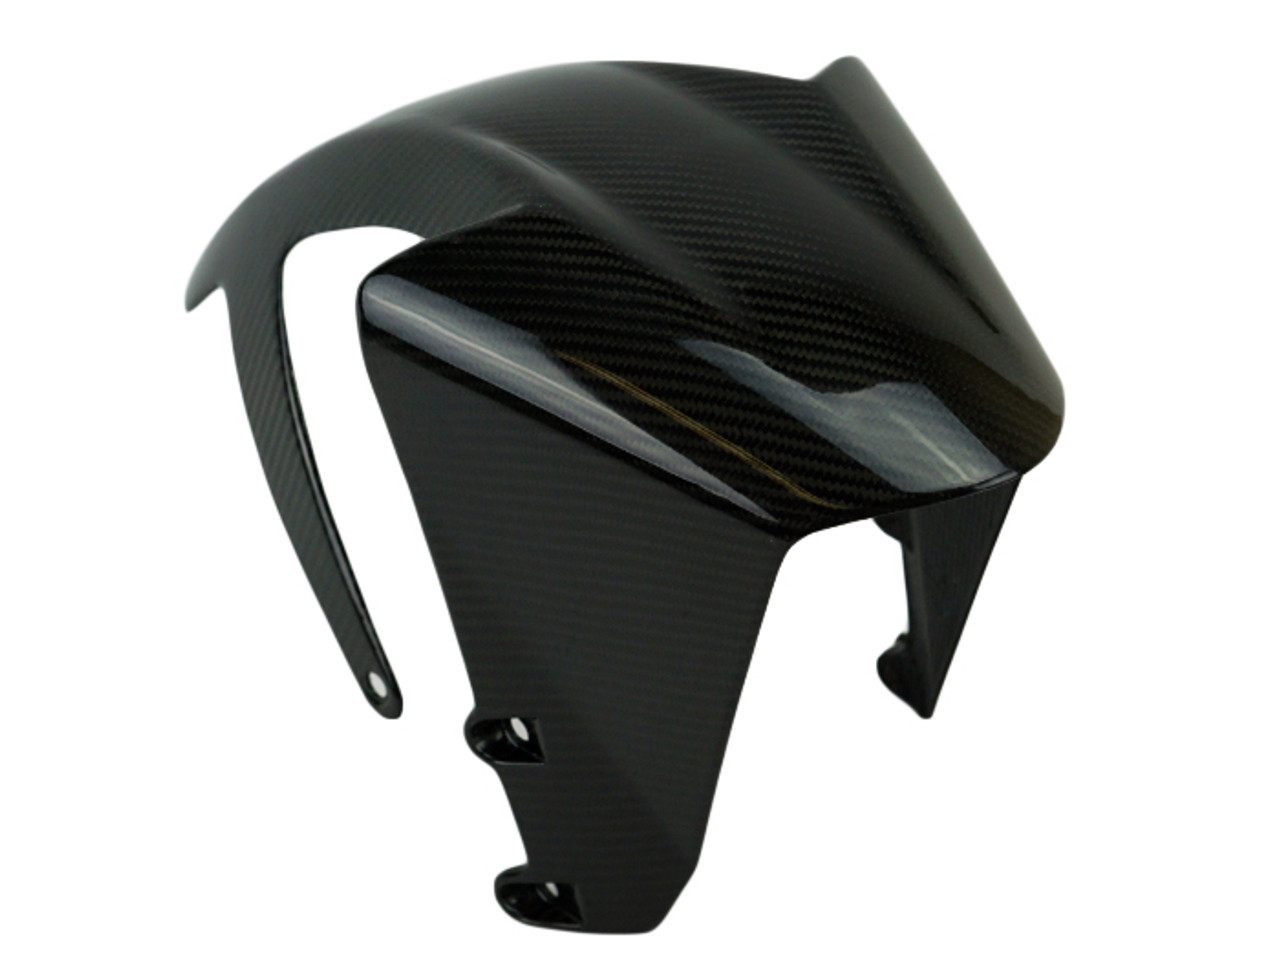 Front Fender ( integral ) in Glossy Twill Weave Carbon Fiber for KTM RC390, Duke 390 2017+